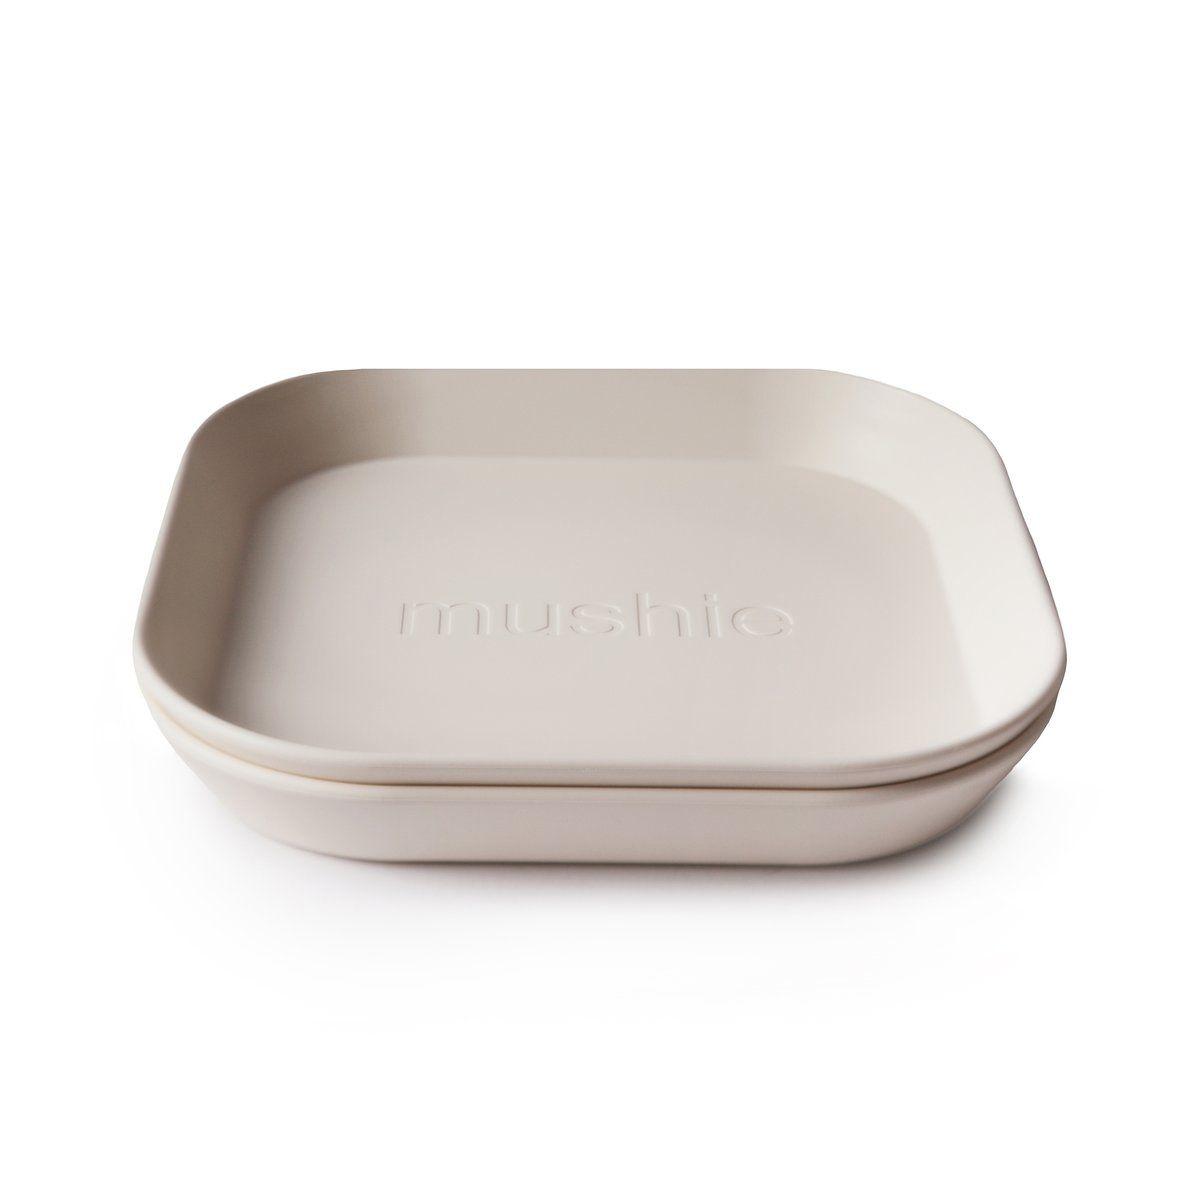 Mushie - hranatý talíř 2ks - Ivory